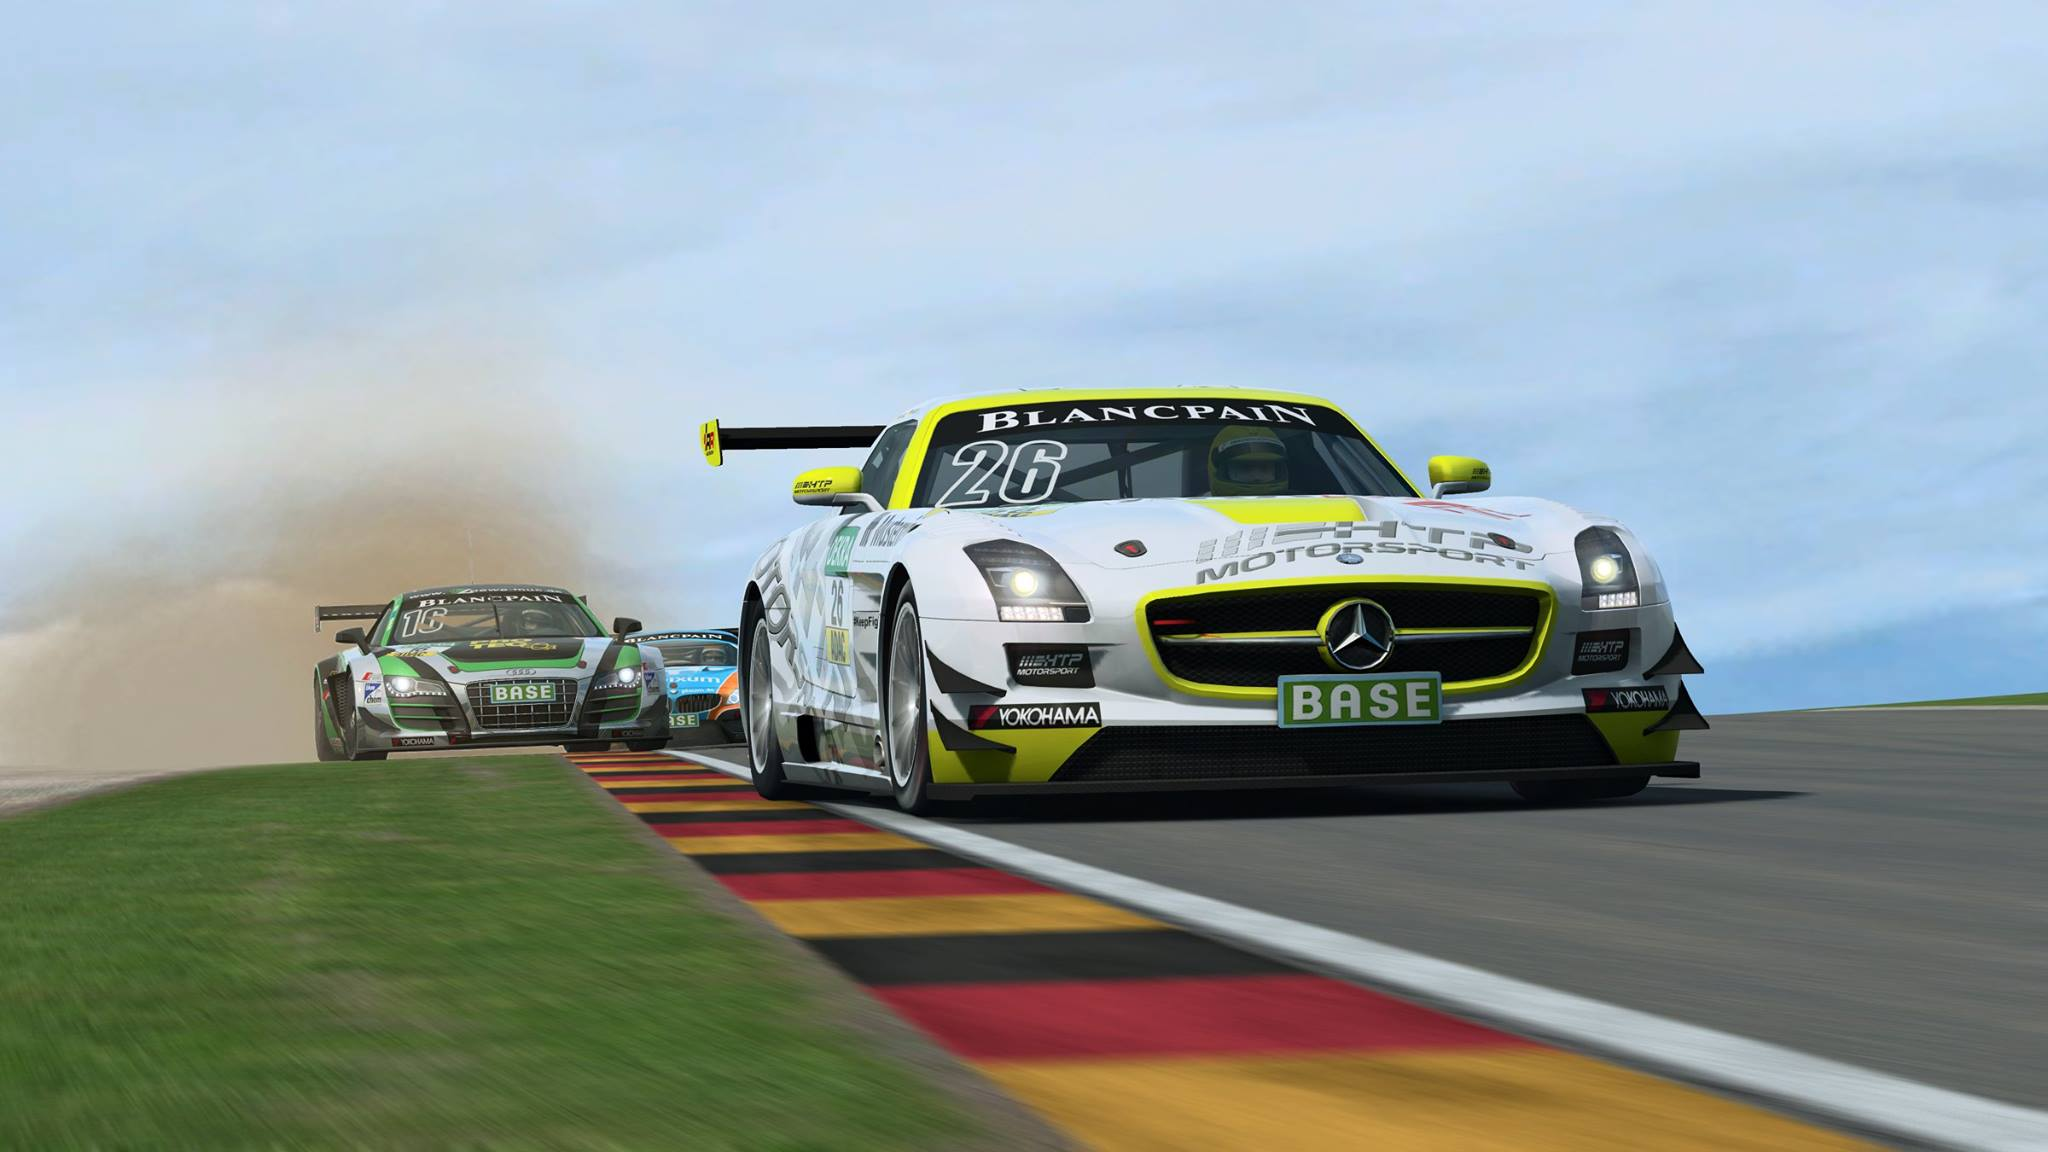 2008 ADAC GT Masters season #